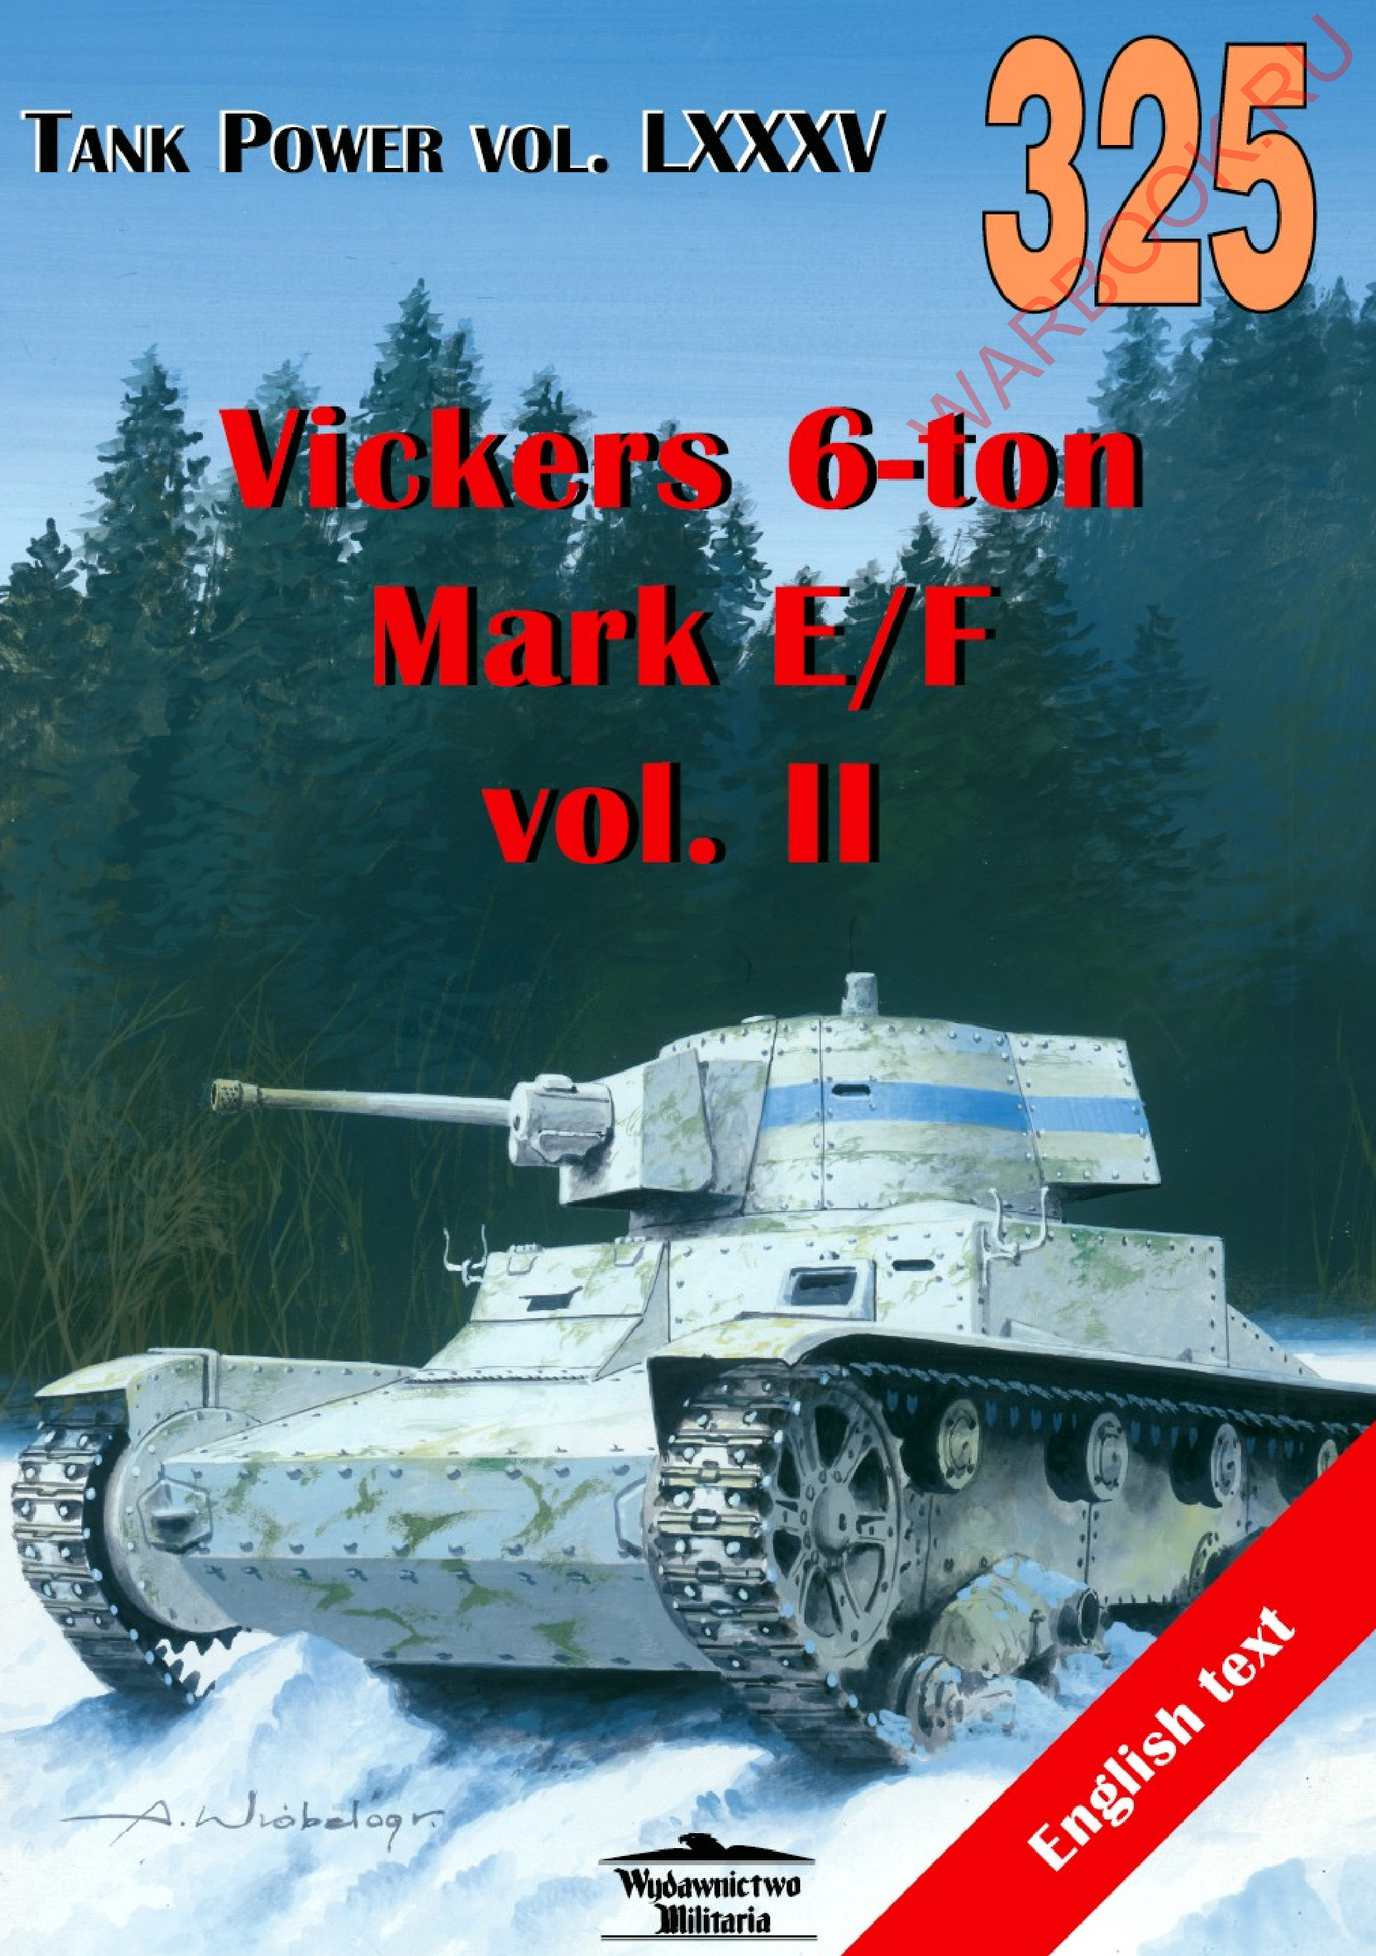 Wydawnictwo Militaria 325 Vickers 6-ton Mark E-F vol.II